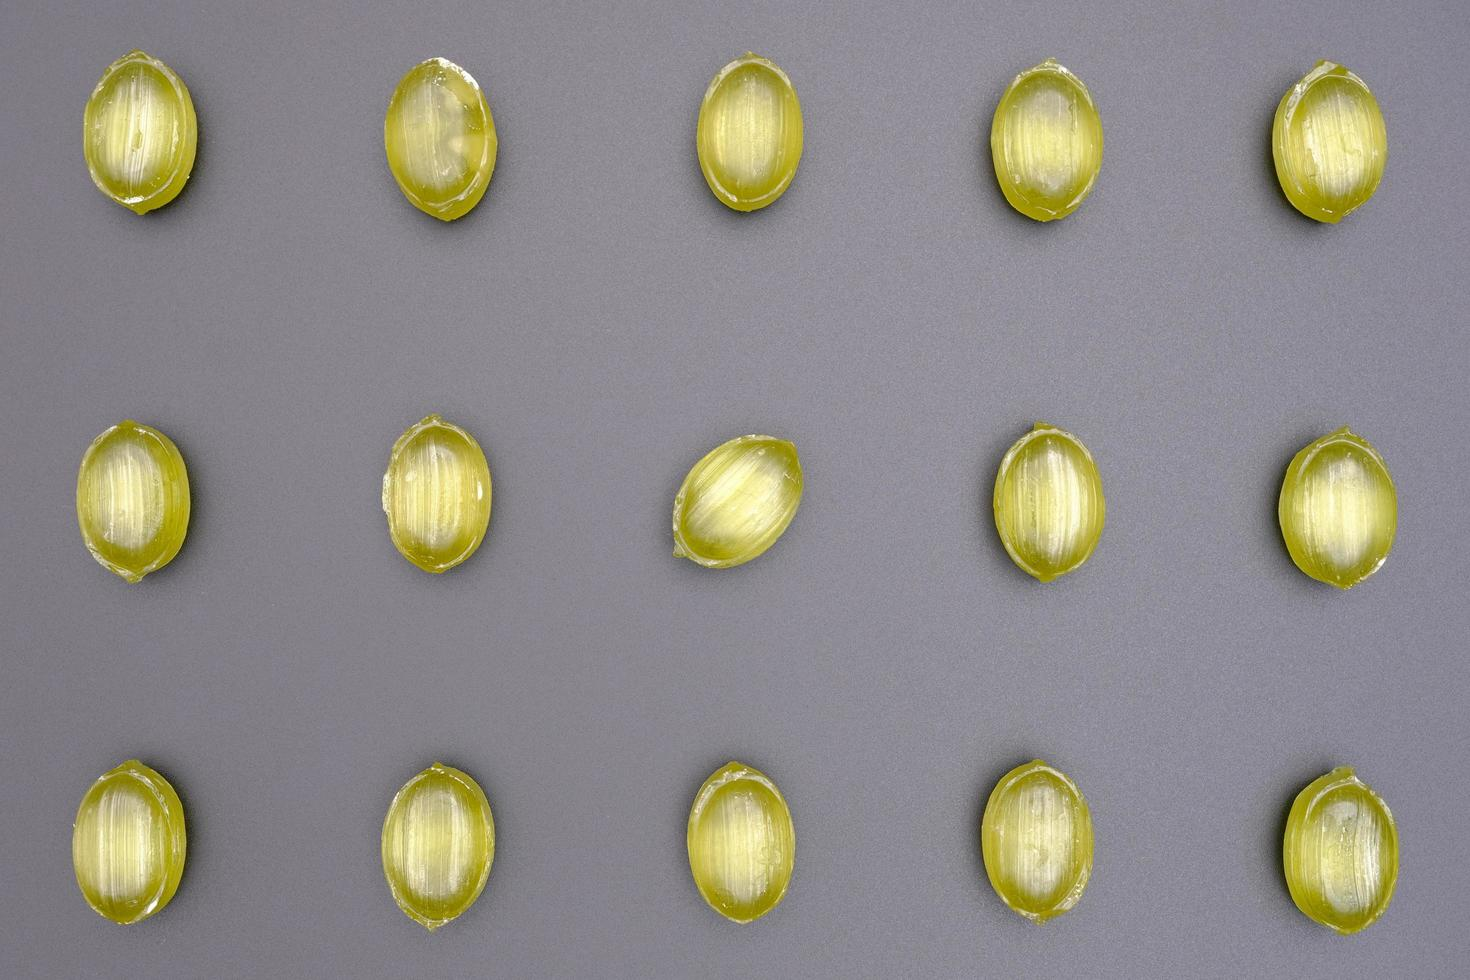 grüne ovale Form glänzendes Karamell Bonbons Muster foto